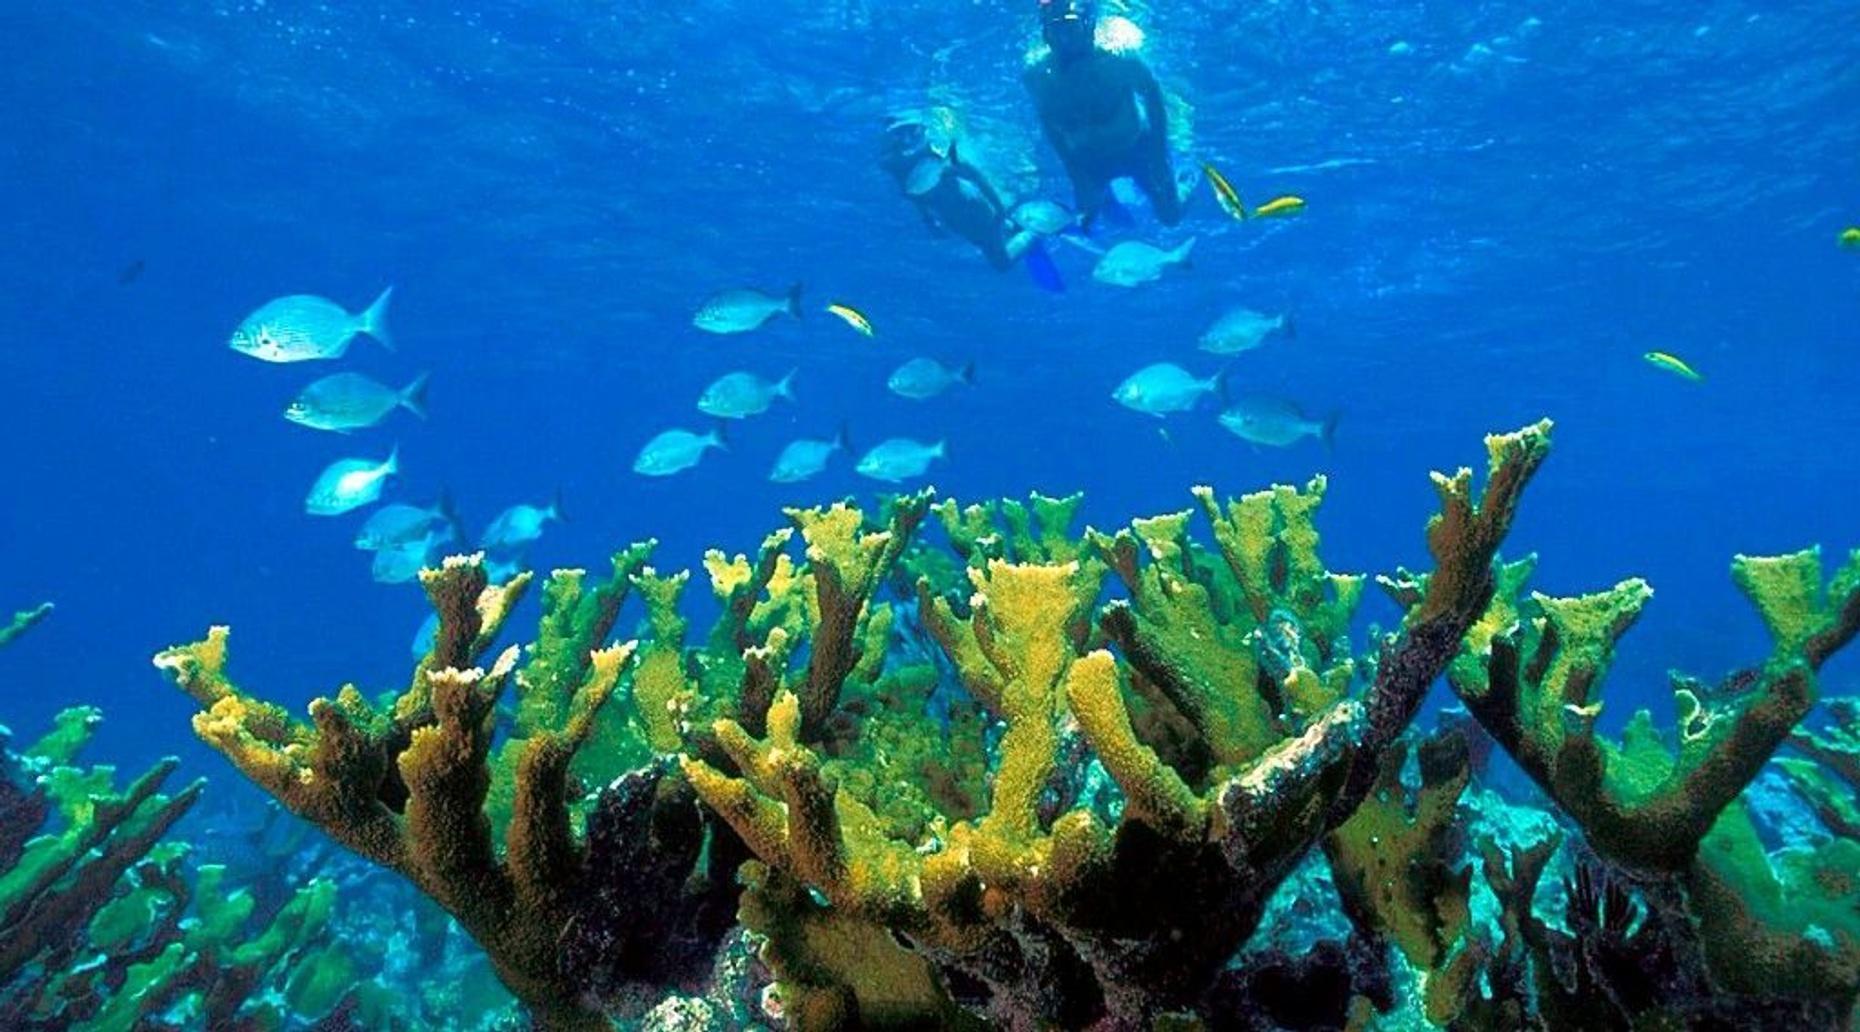 Snorkeling & Beach Day in Cancun